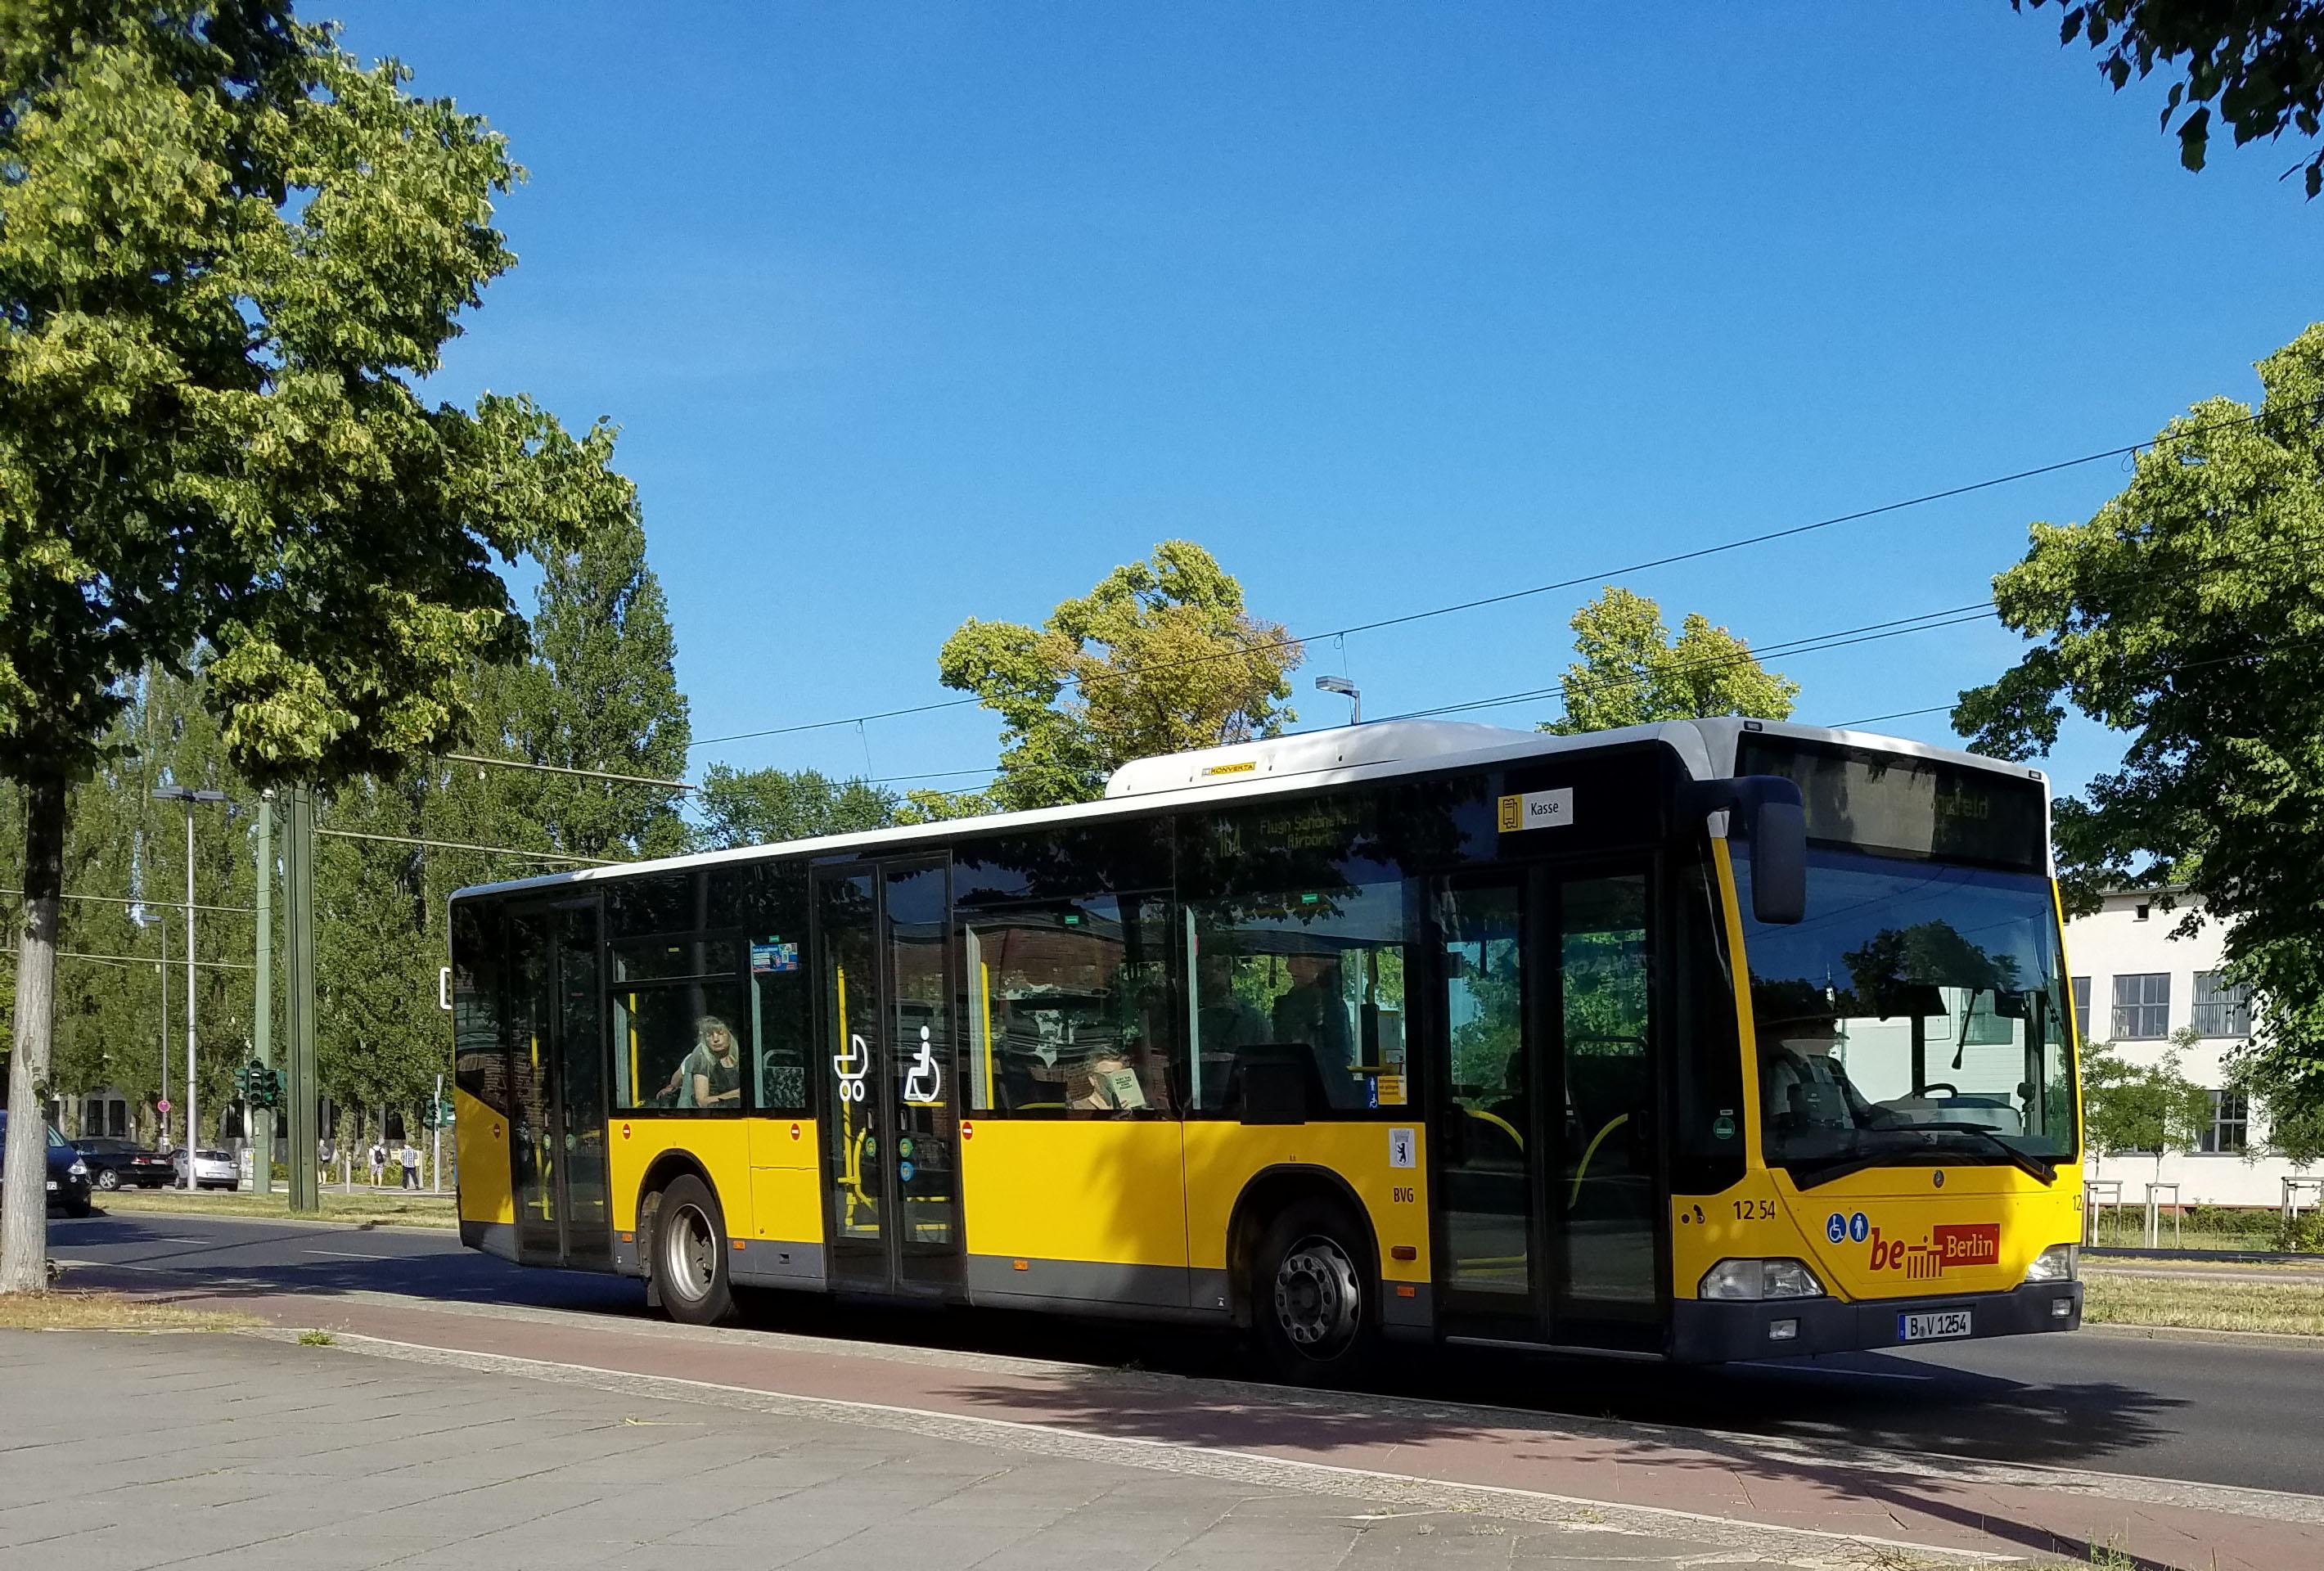 Foto: Bus 1254, Typ Citaro O530, Adlershof, Juni 2017